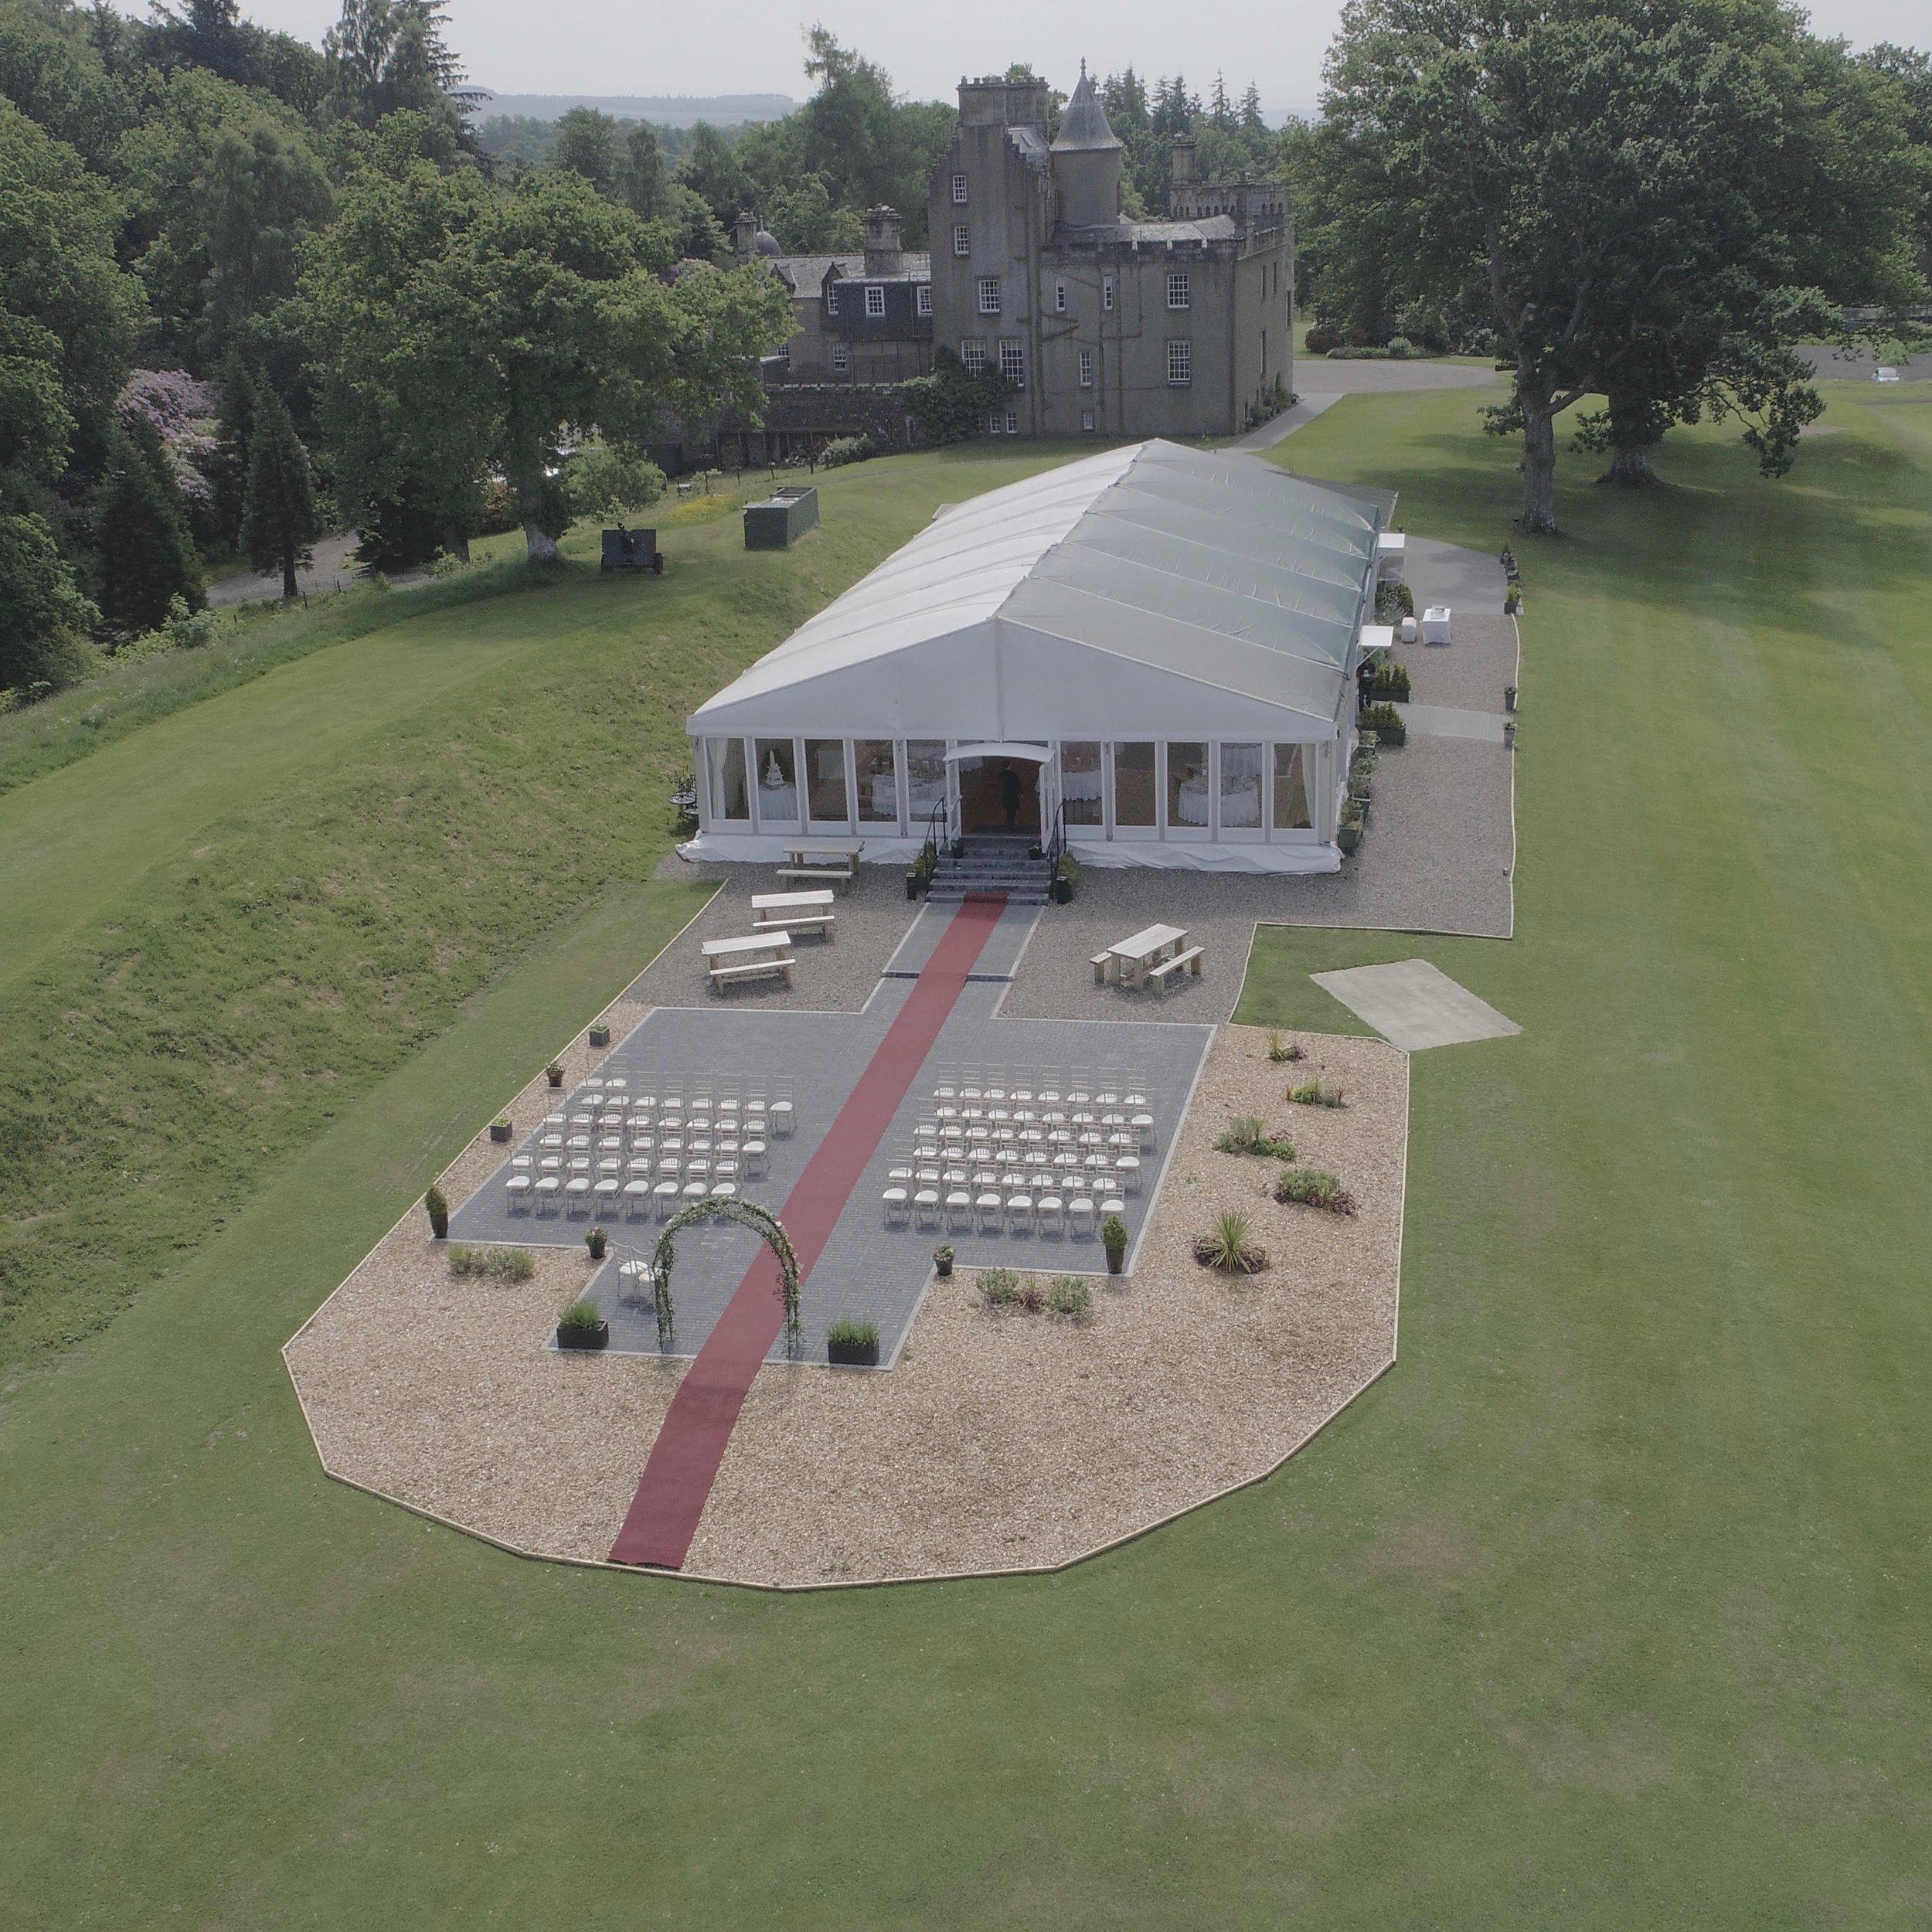 boturich castle scottish wedding venues1.jpg